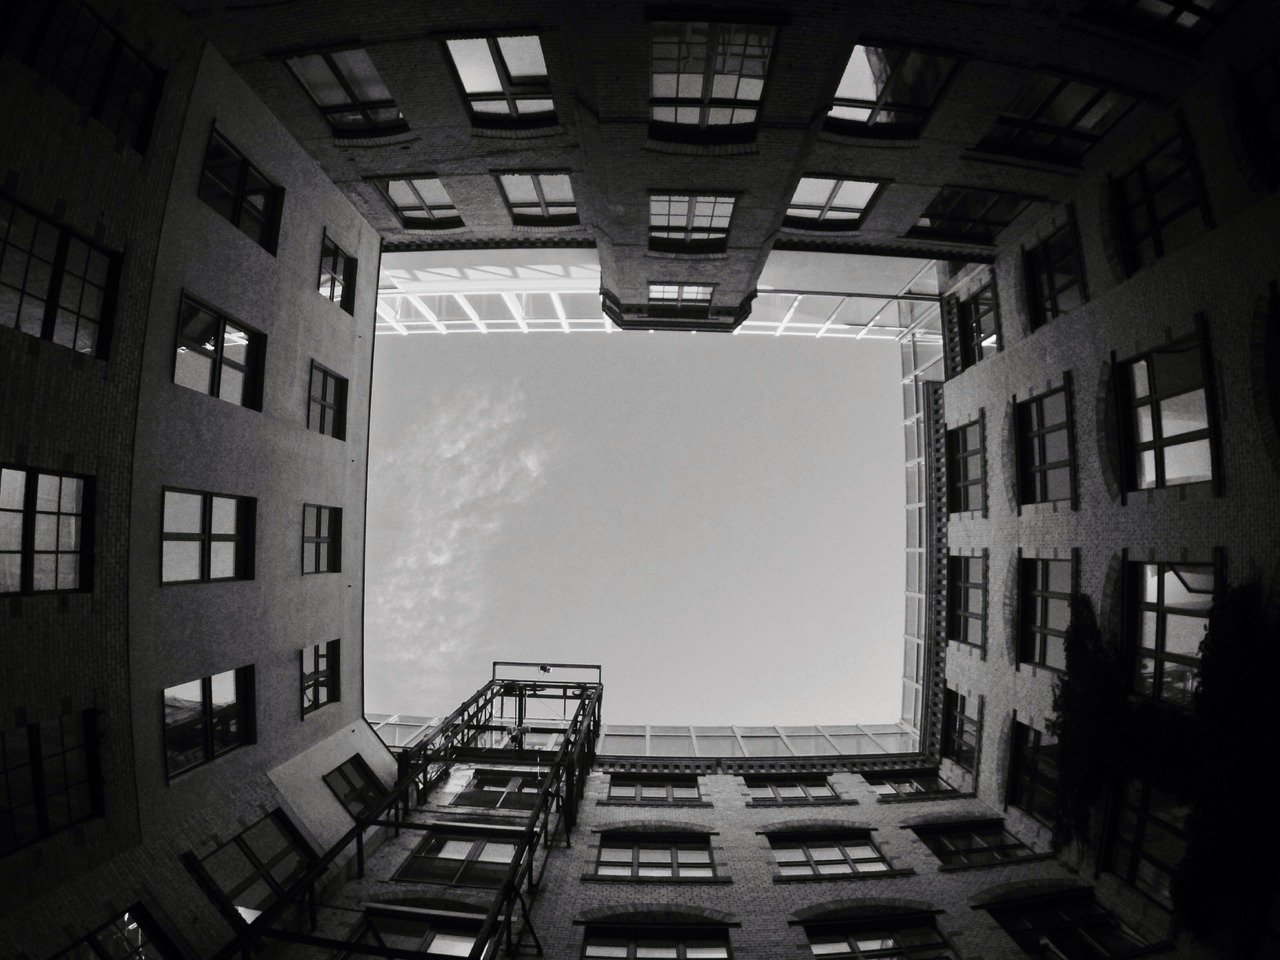 #LookingUp #Berlin #igersberlin